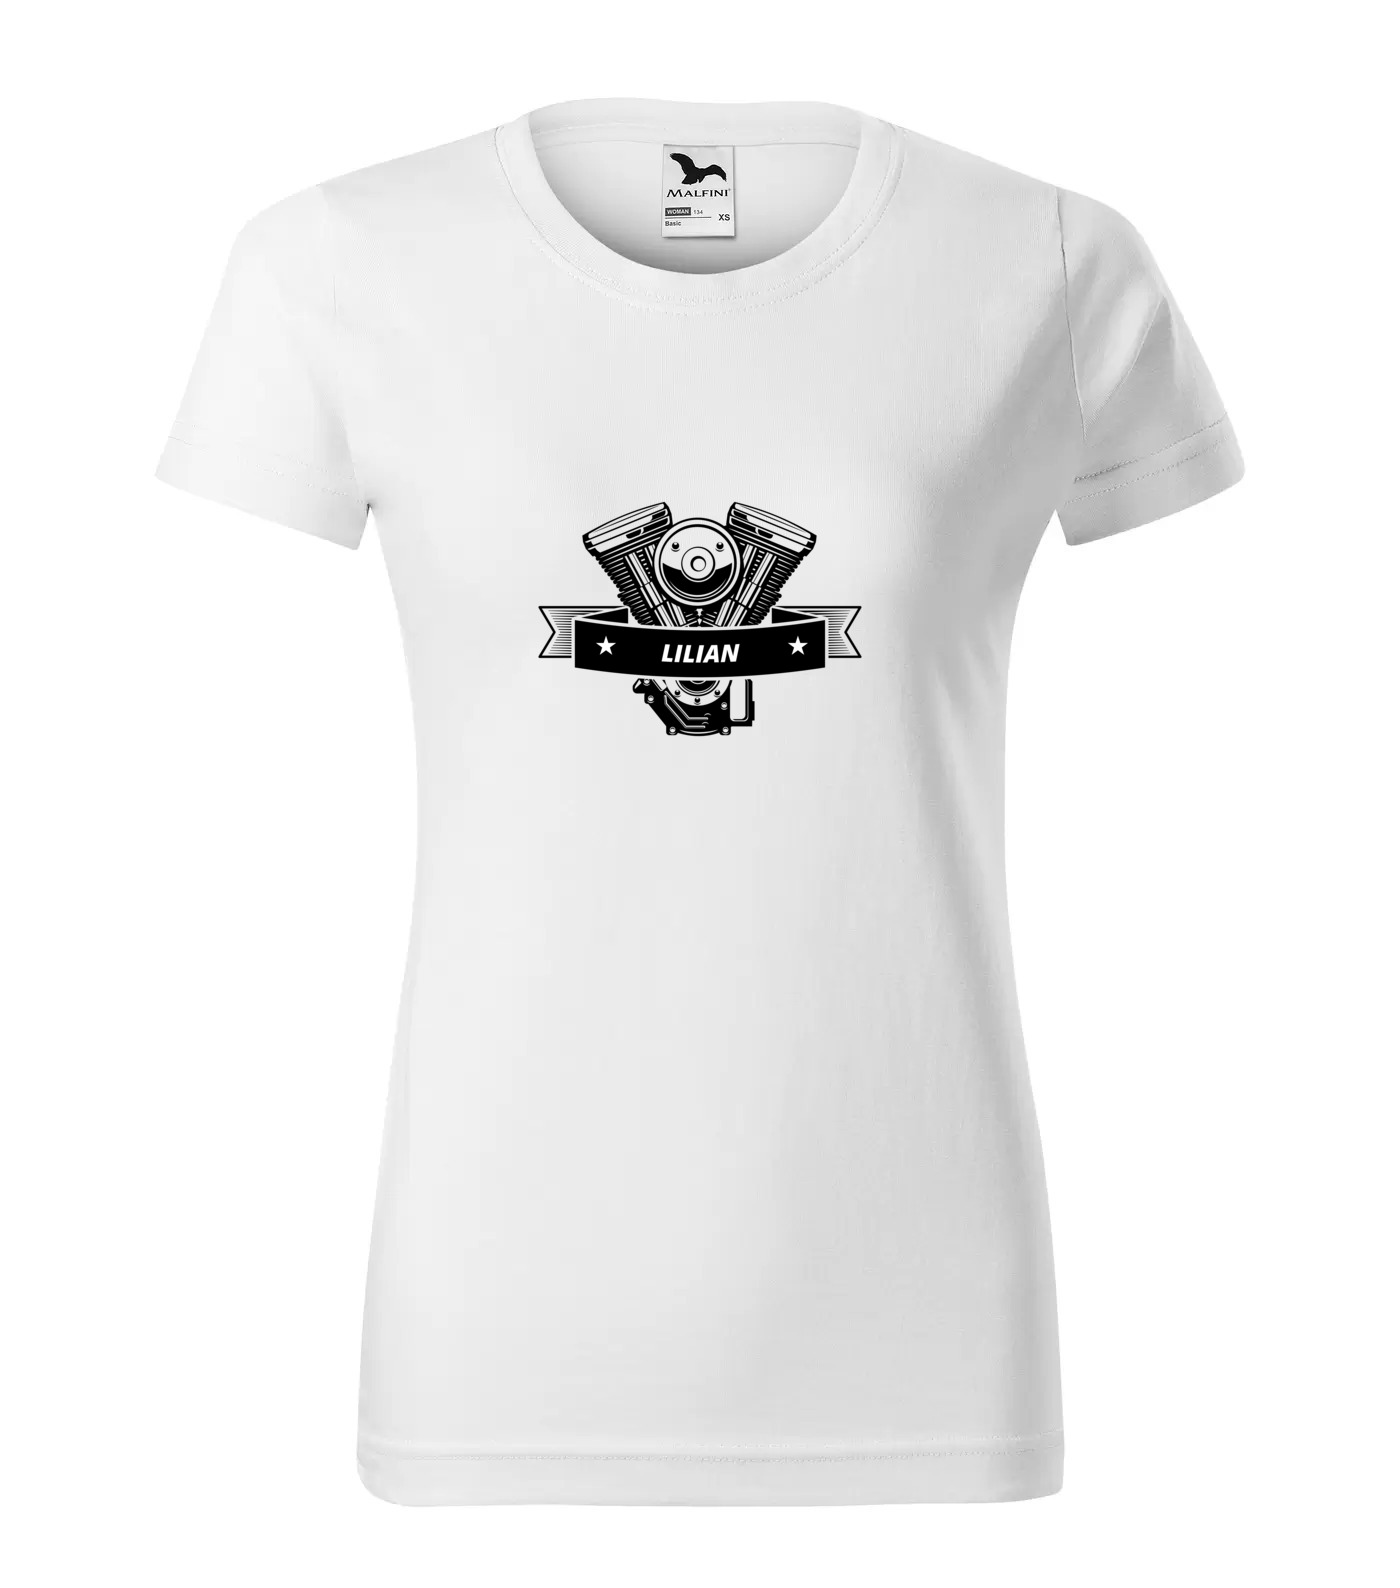 Tričko Motorkářka Lilian